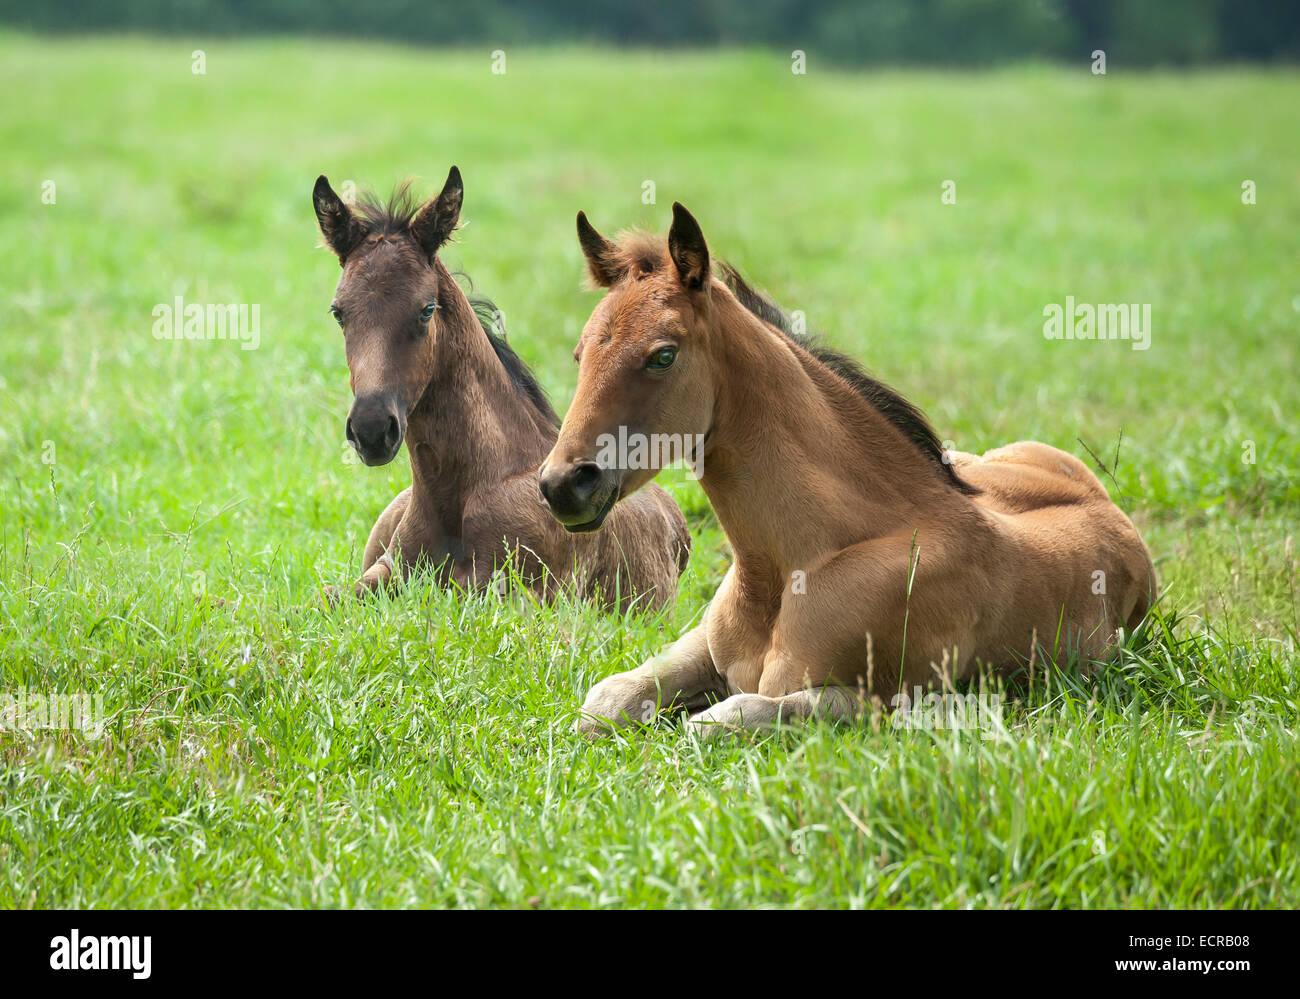 Quarter Horse Fohlen im Grass liegen Stockbild